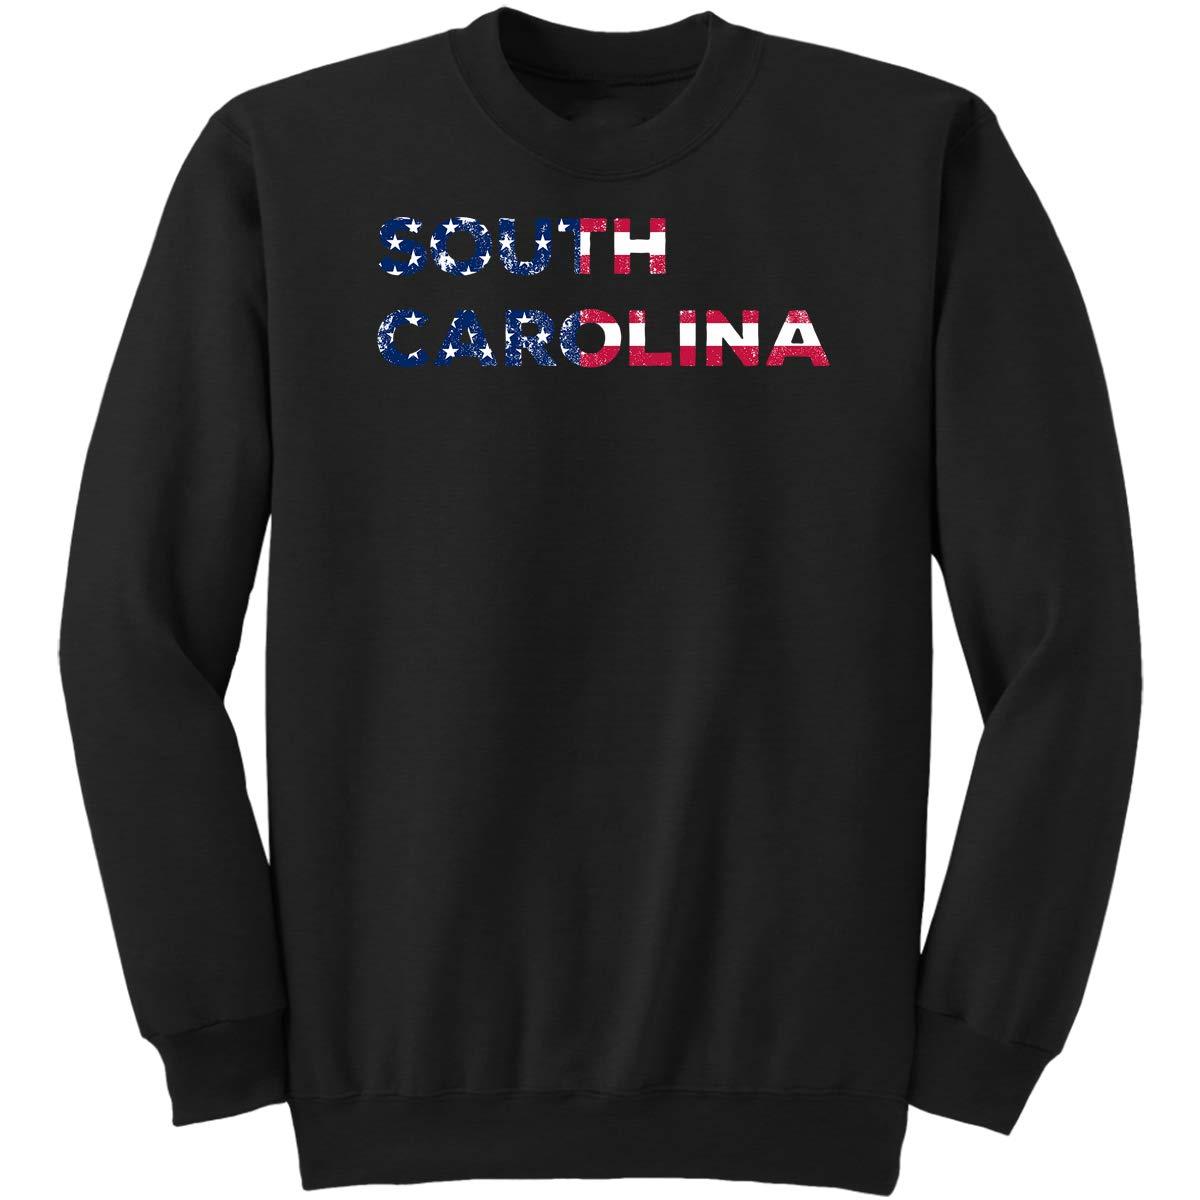 South Carolina-State Pride America Flag Sweatshirt South Carolina State Gifts